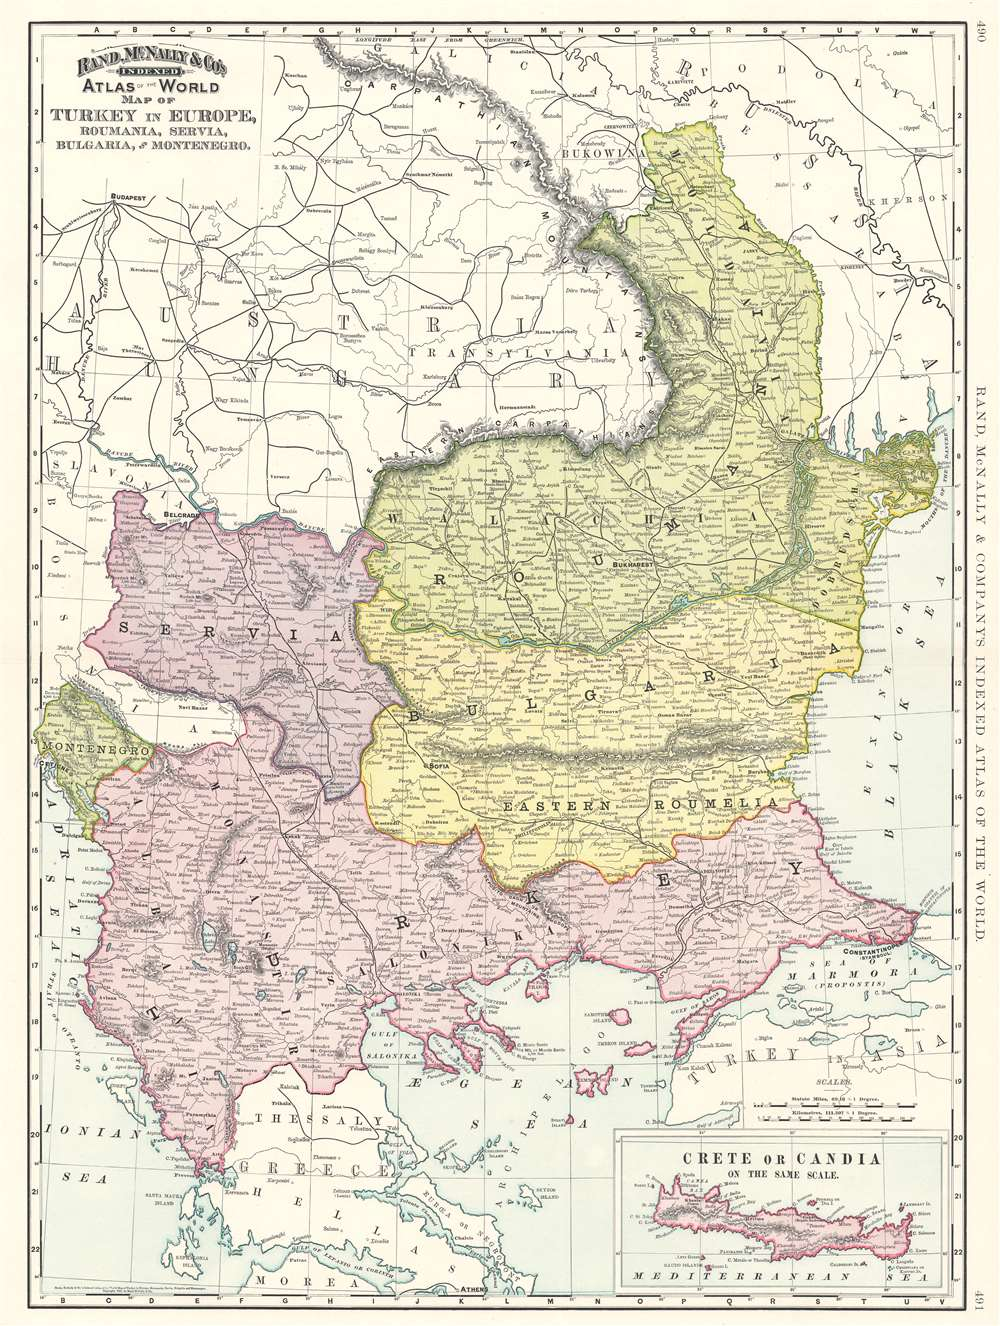 Map of Turkey in Europe, Roumania, Servia, Bulgaria and Montenegro. - Main View